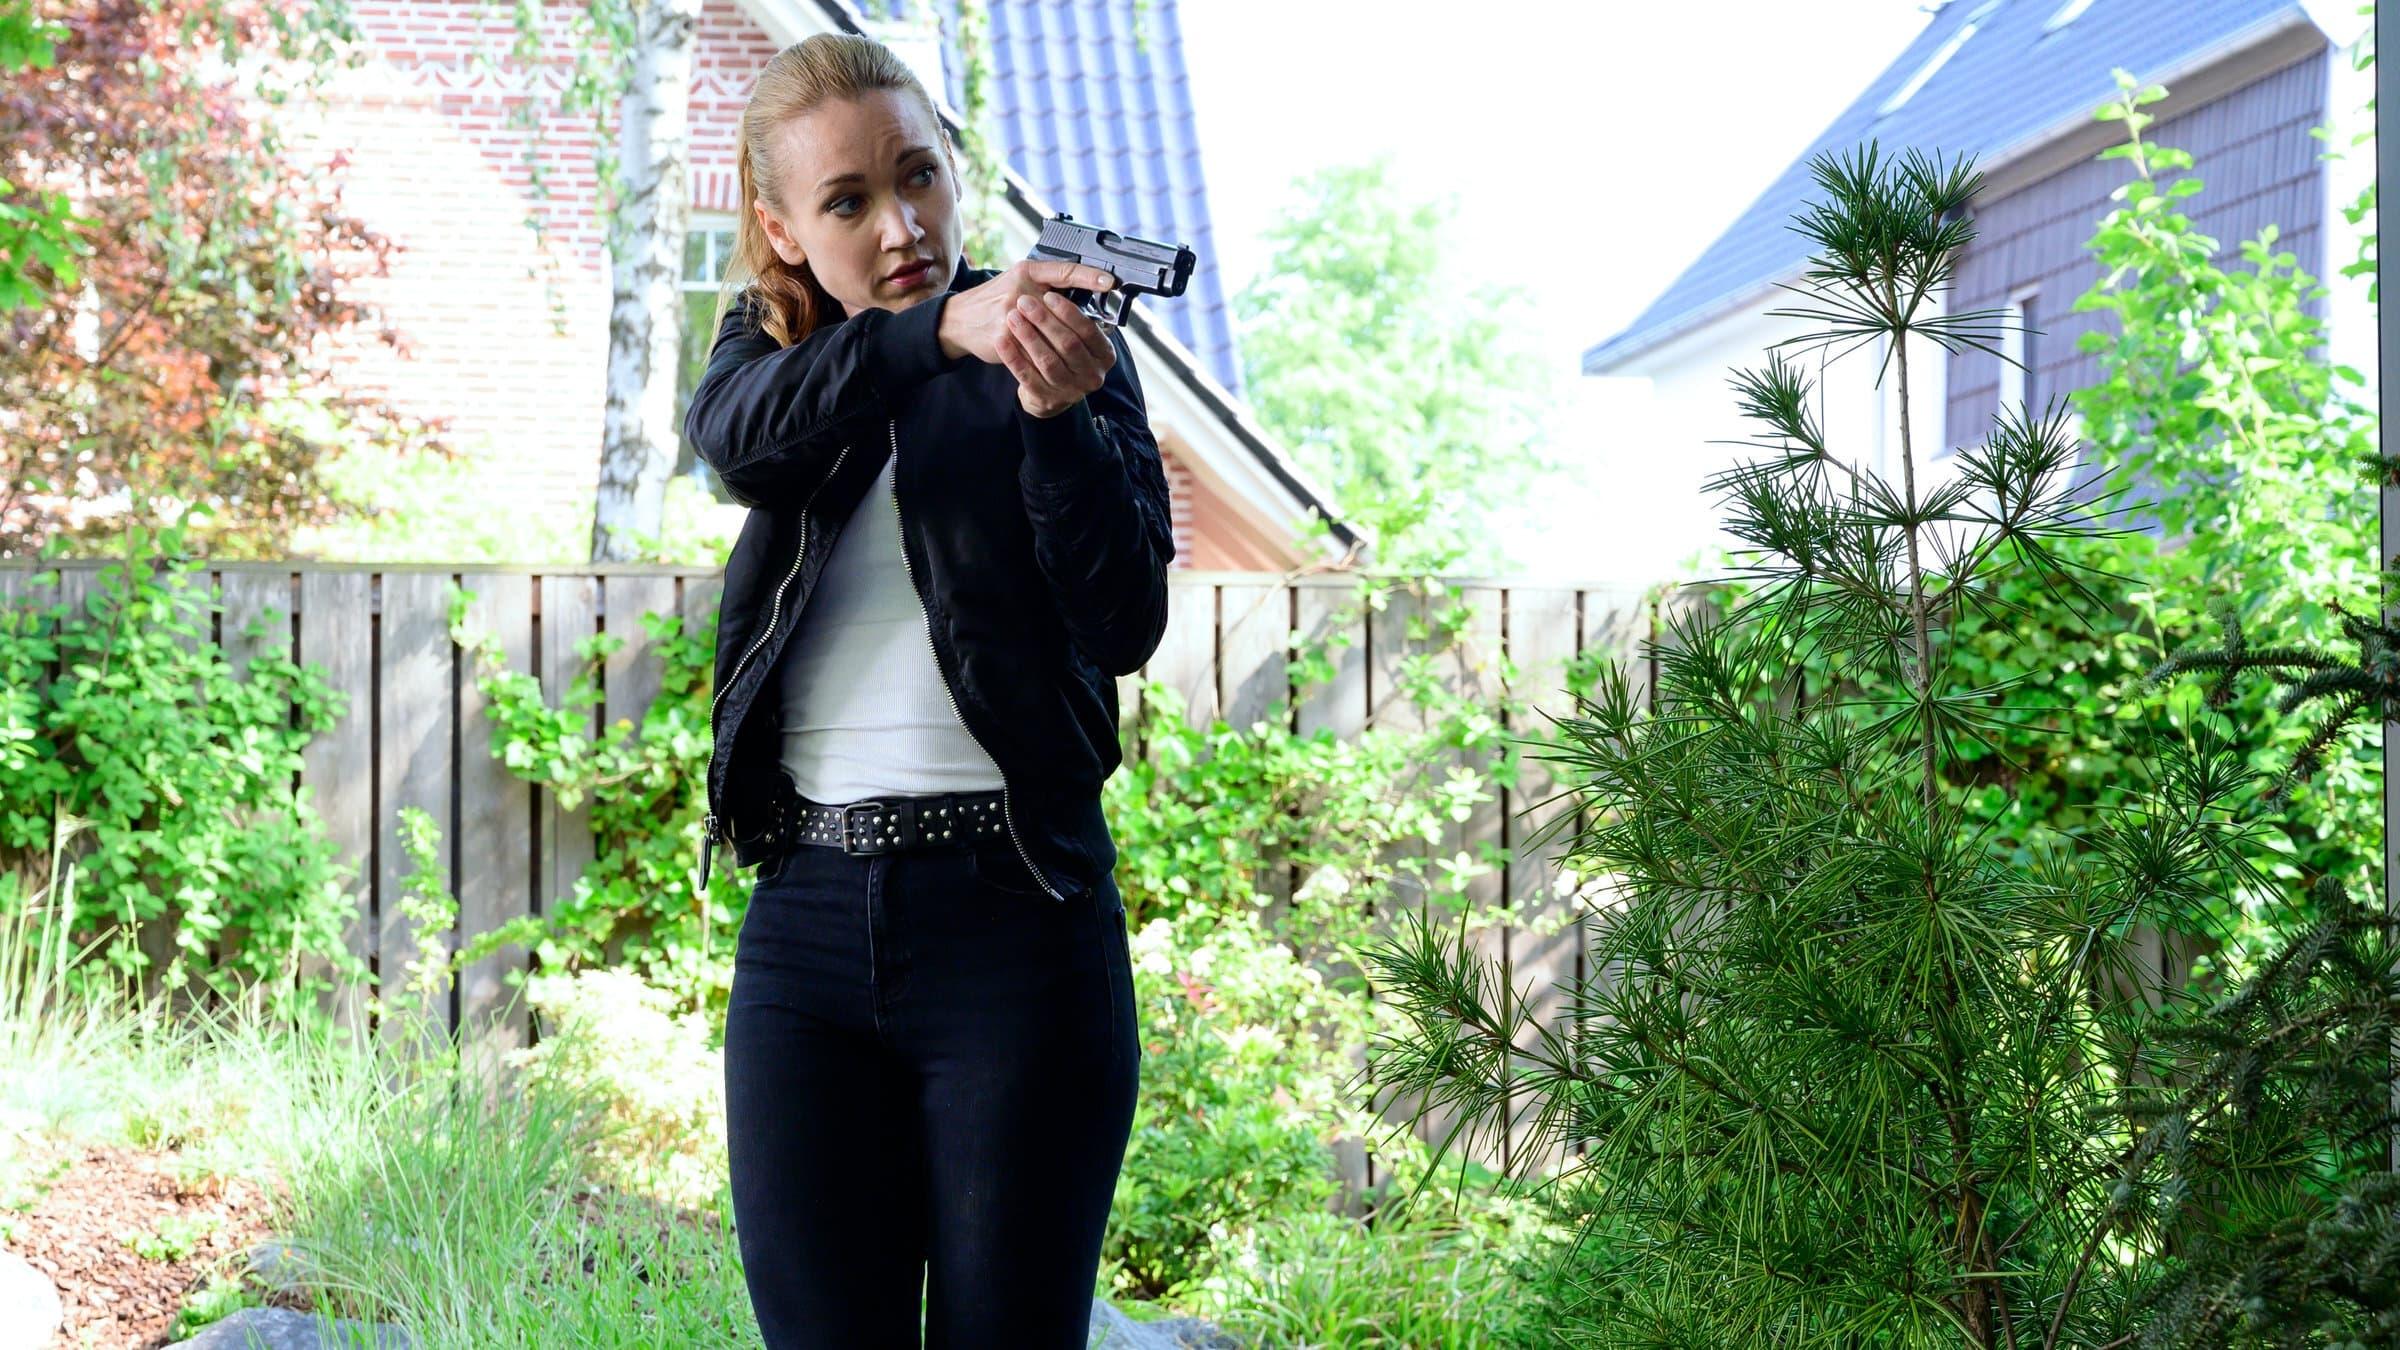 Sarah Kohr - Stiller Tod (2021) English Full Movie Watch Online